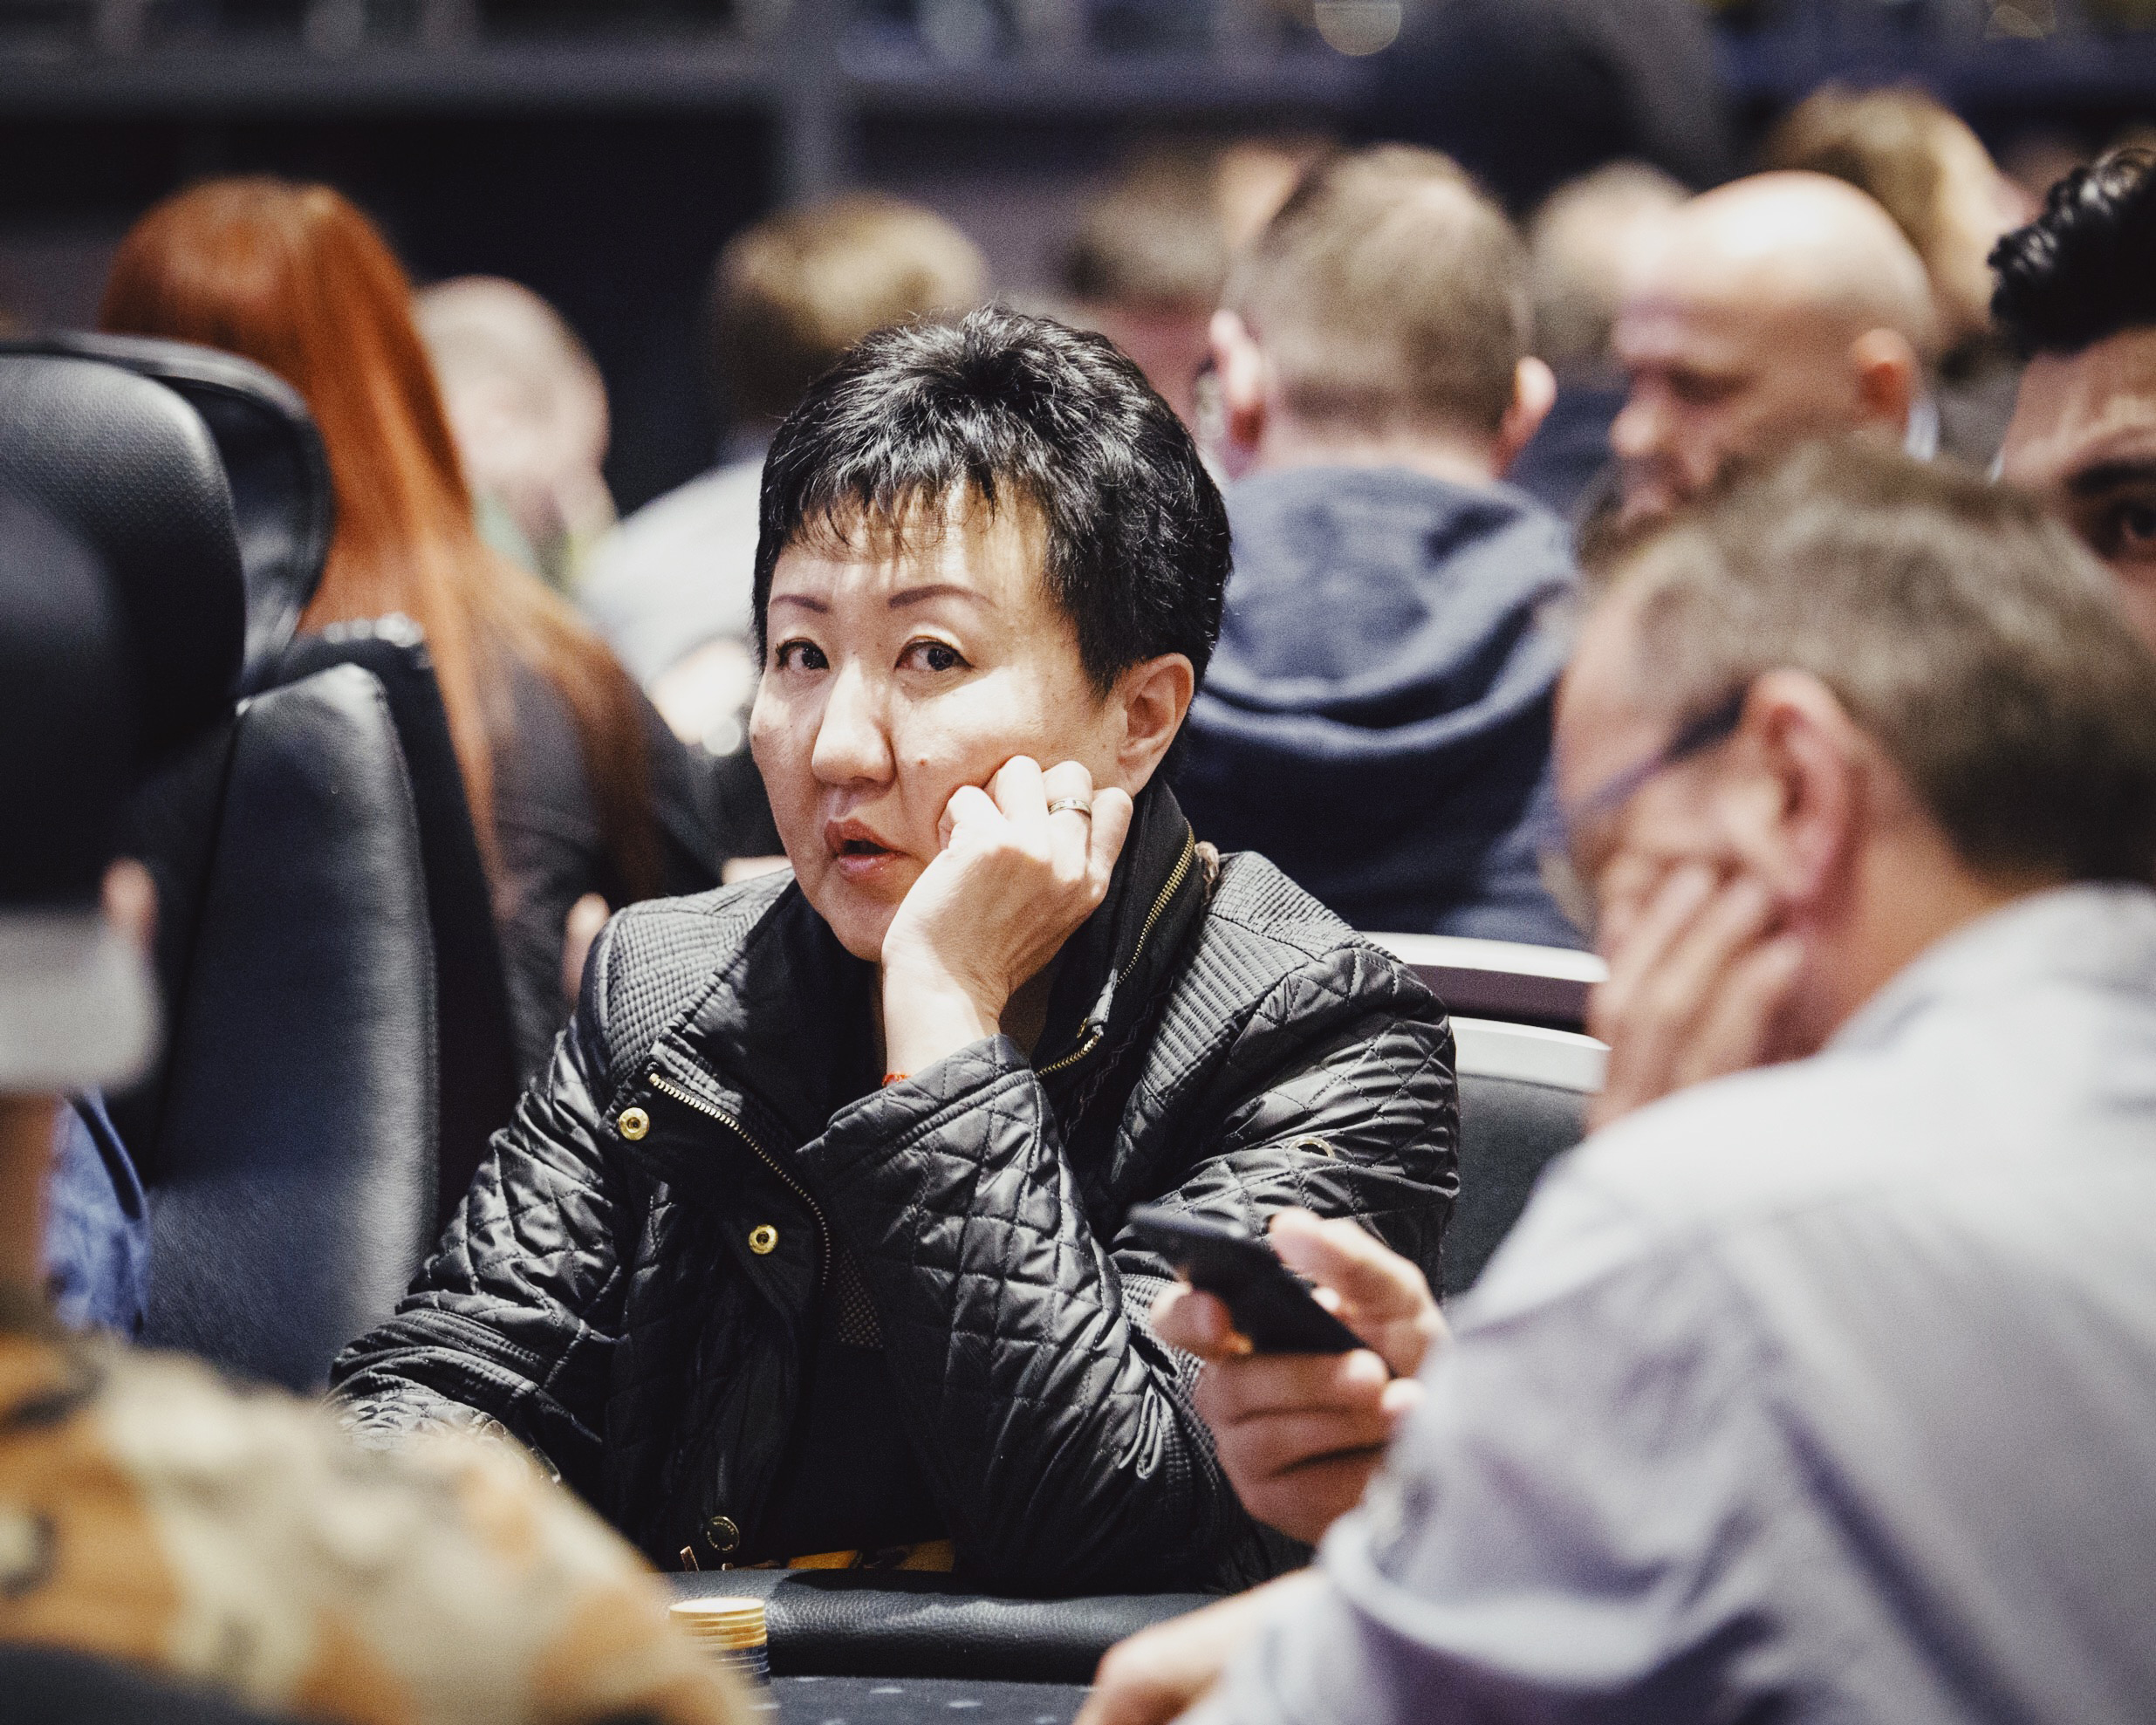 polina-shubkina-poker-039.JPG